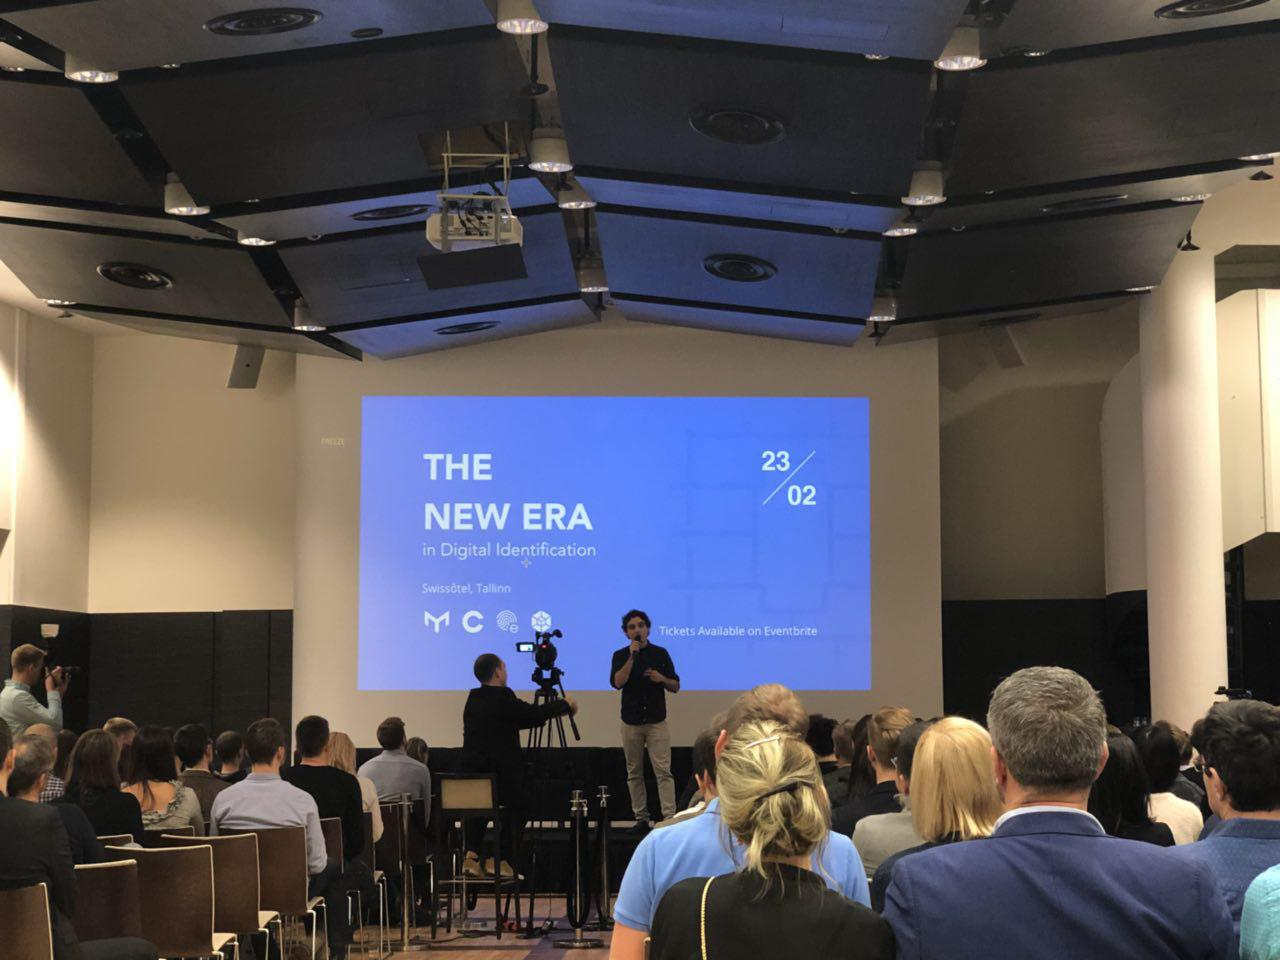 Приняли участие в конференции - The New Era in Digital Identification